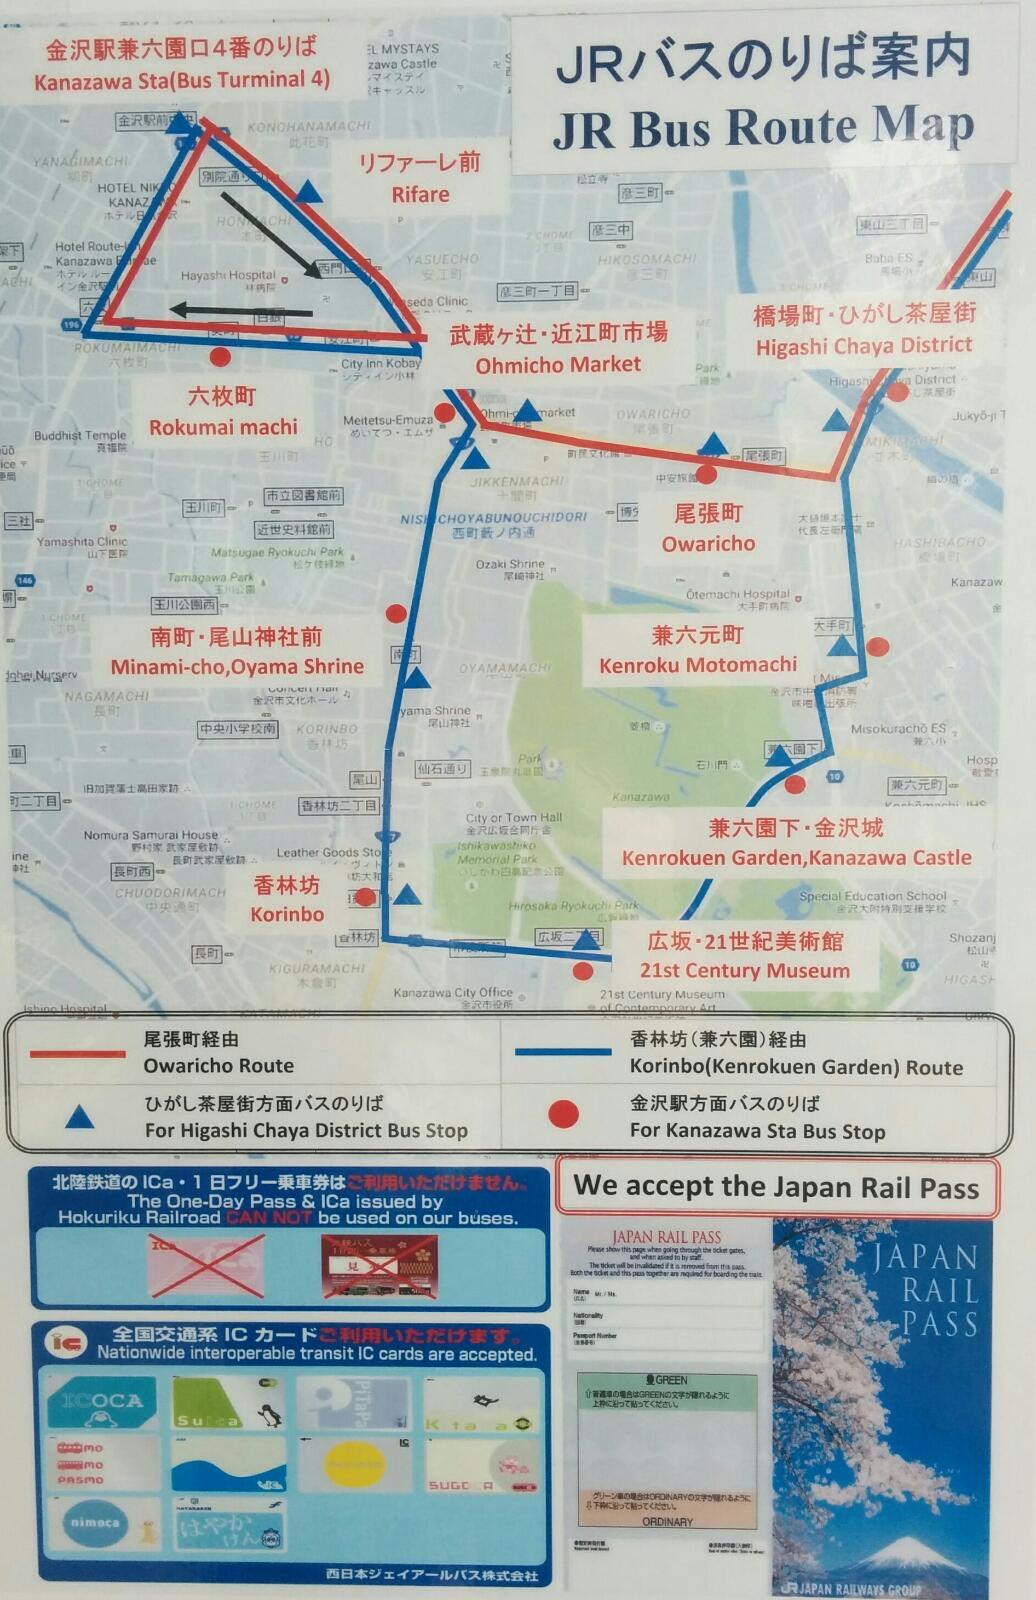 Mapa del recorrido del autobús JR